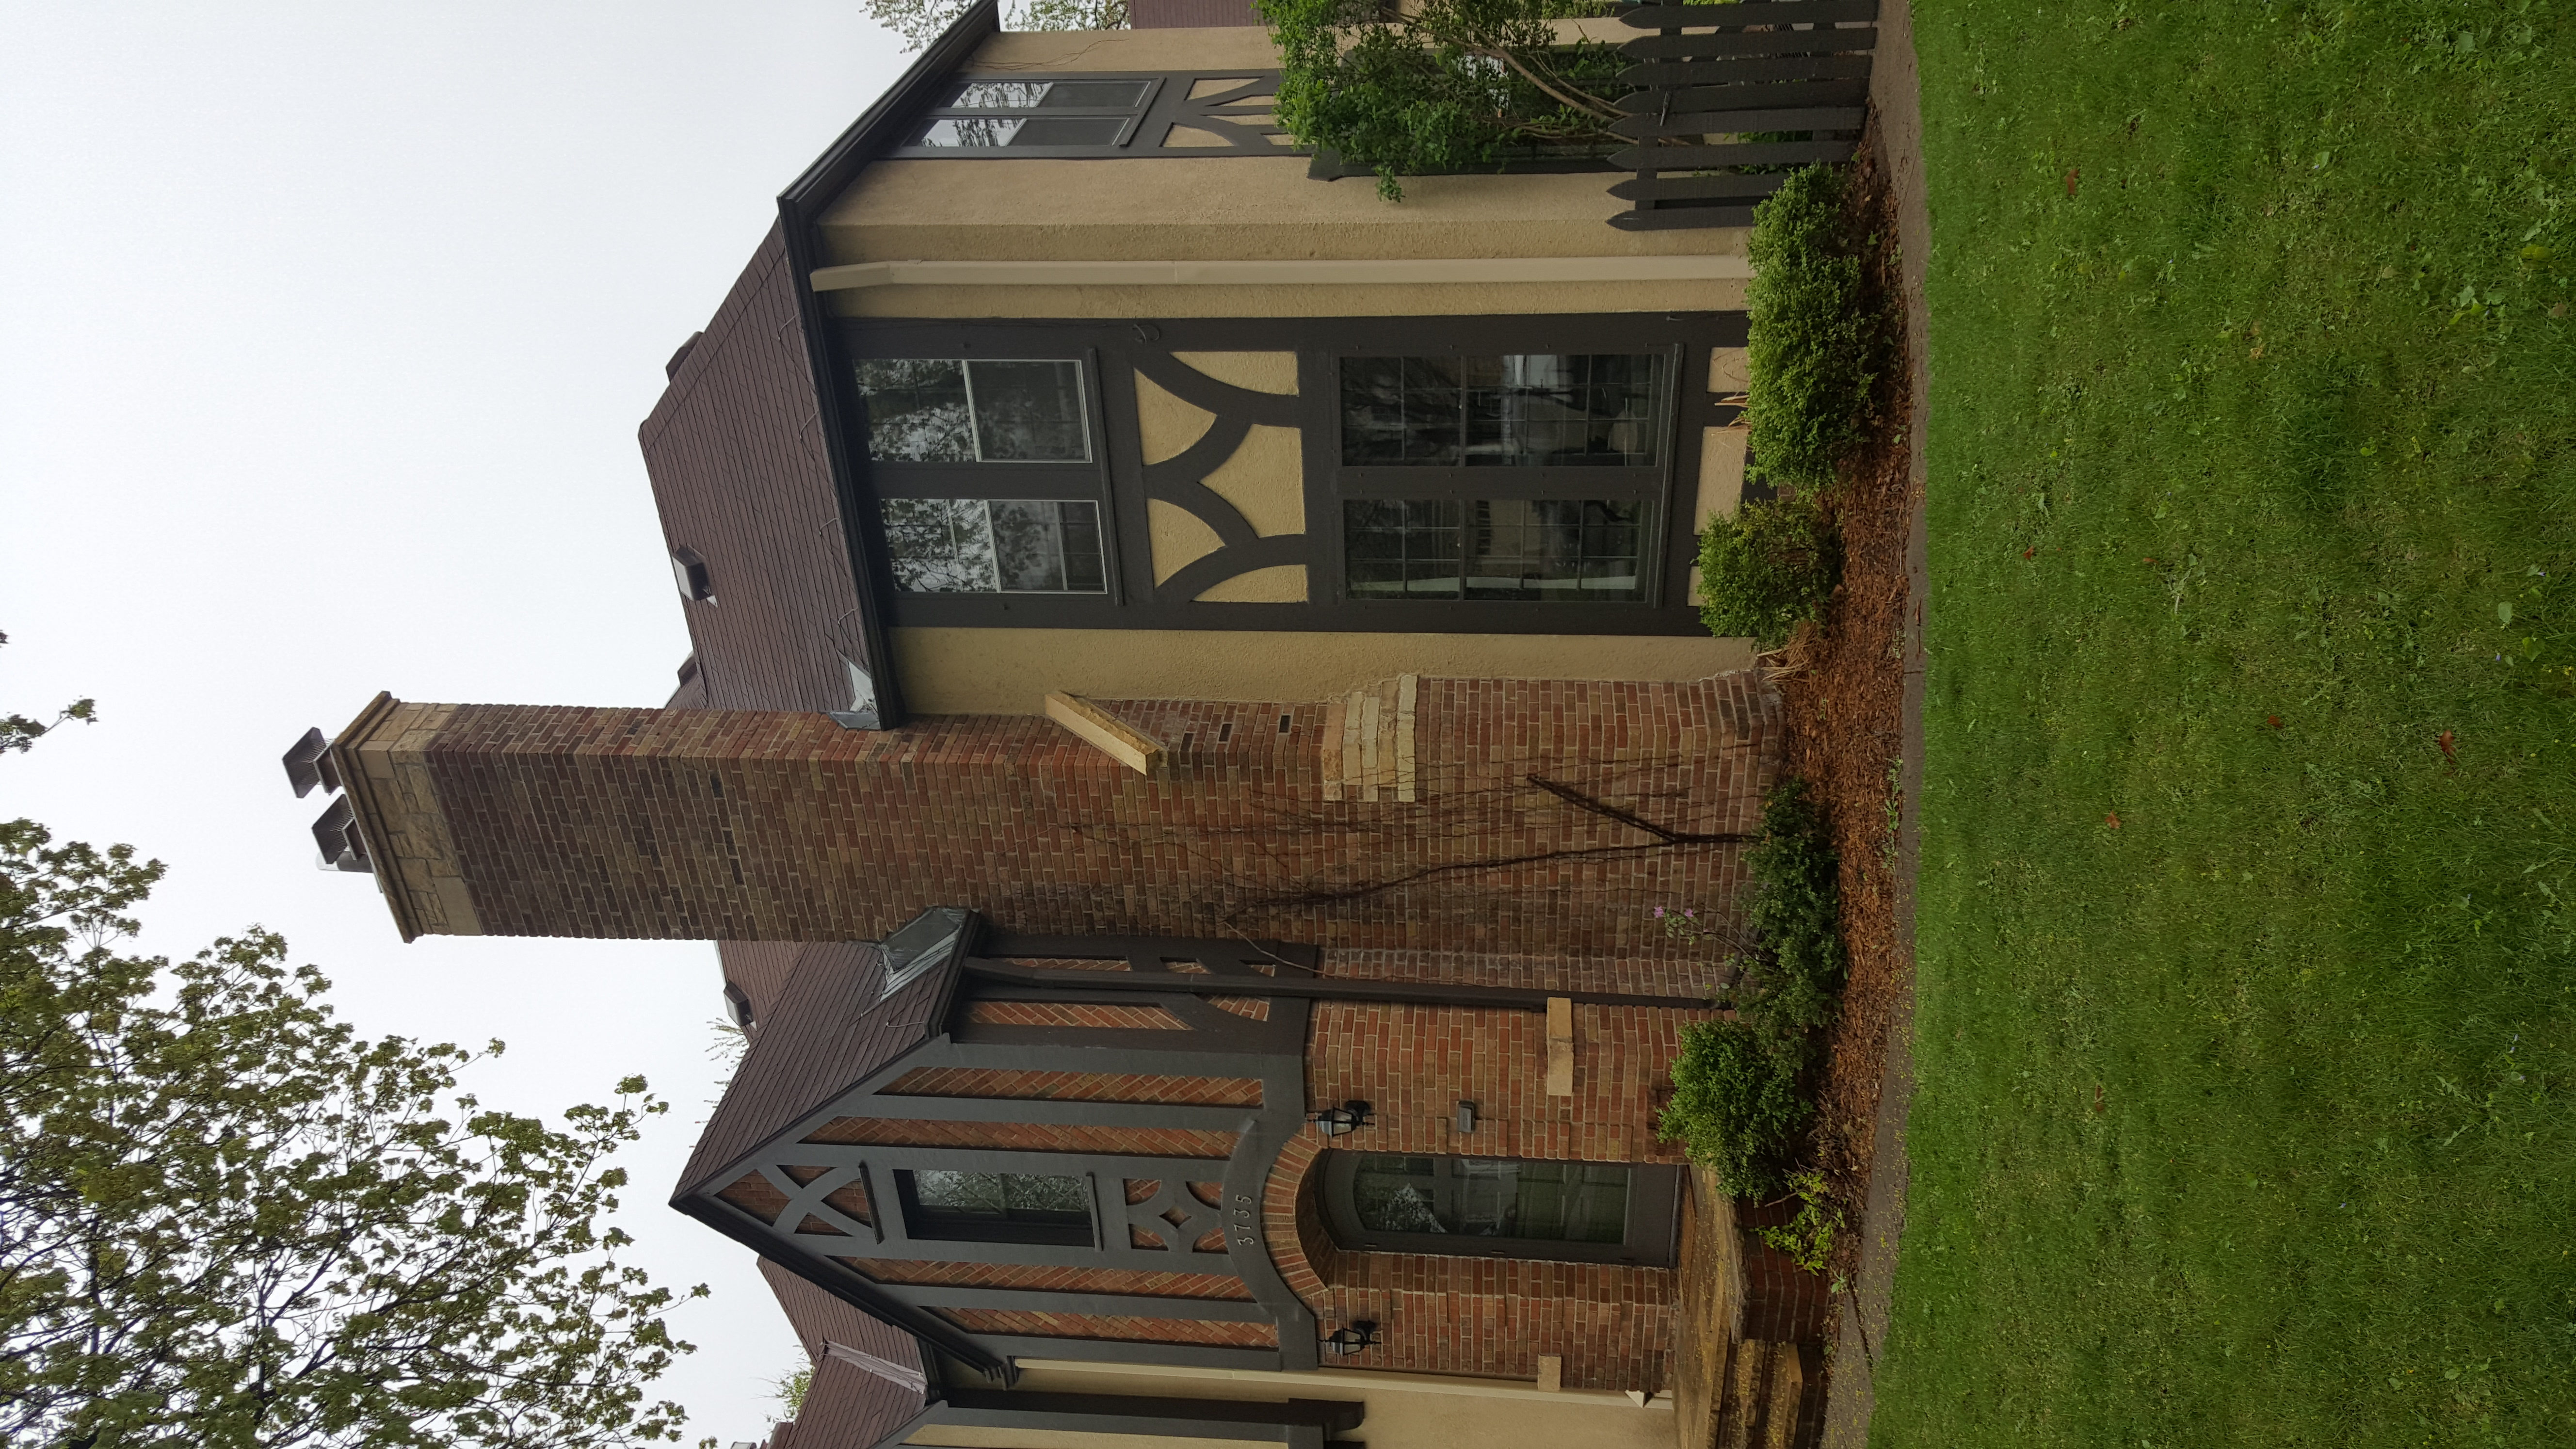 Brick Chimneys (14)